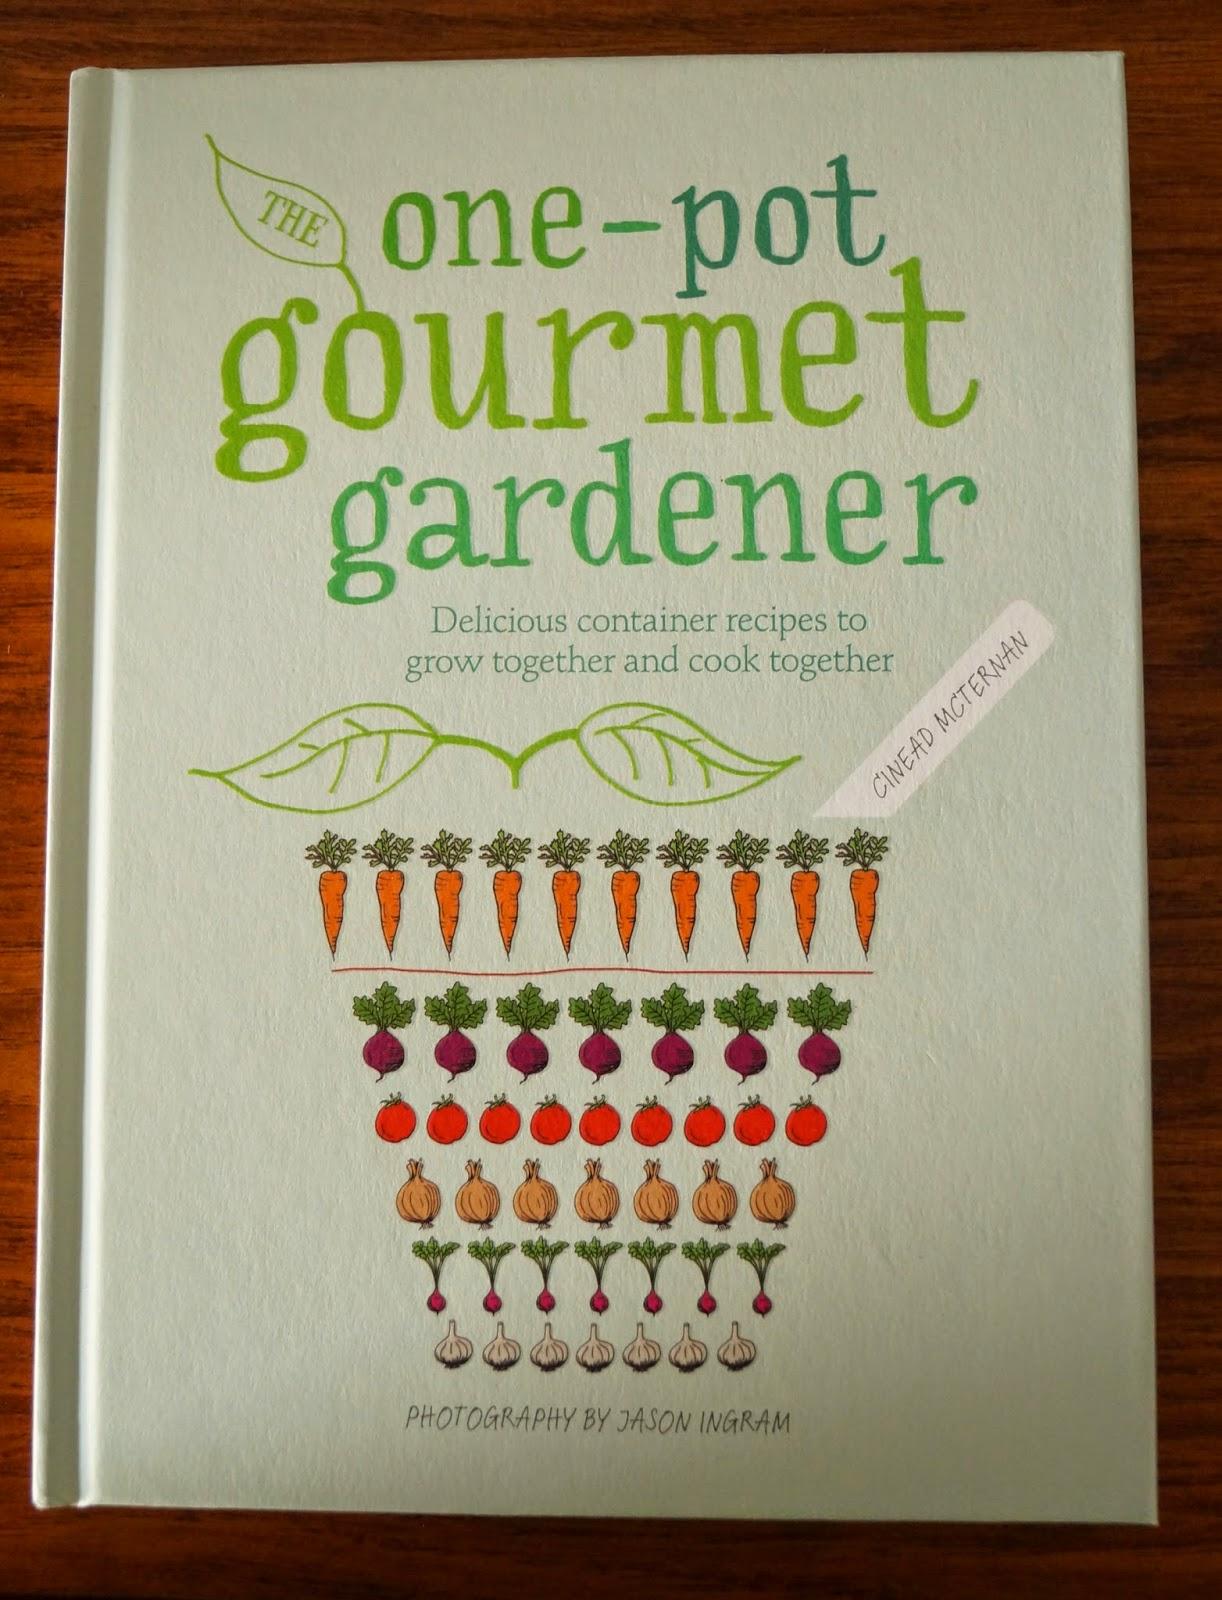 'the one-pot gourmet gardener' book~ growourown.blogspot.com